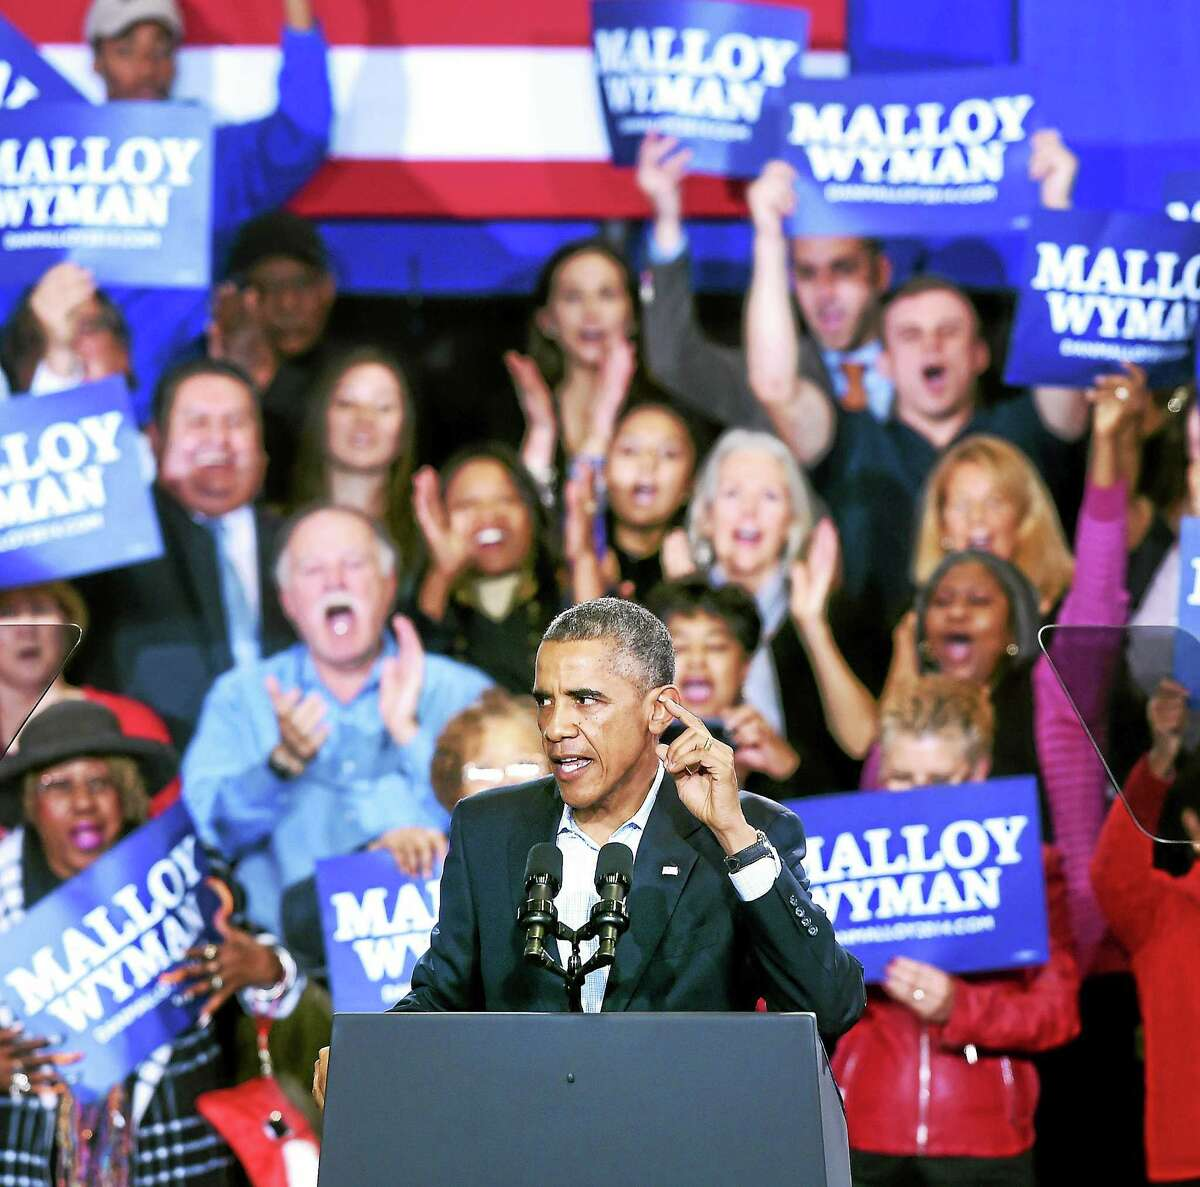 President Barack Obama campaigns for Gov. Dannel Malloy at Central High School in Bridgeport on Sunday.